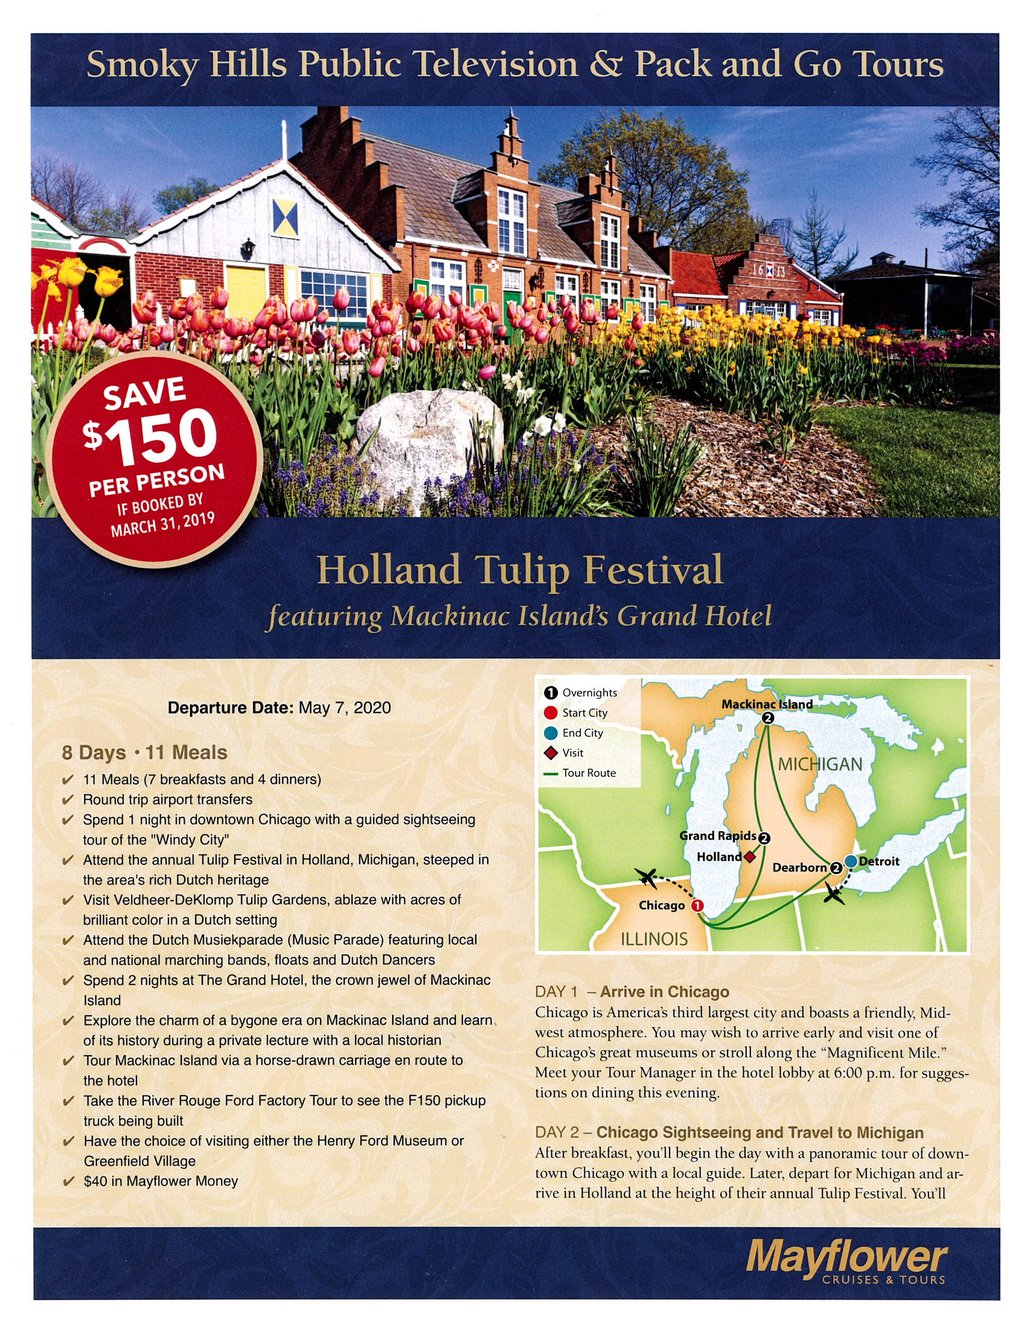 Holland Tulip Festivalpic_Page_1.jpg